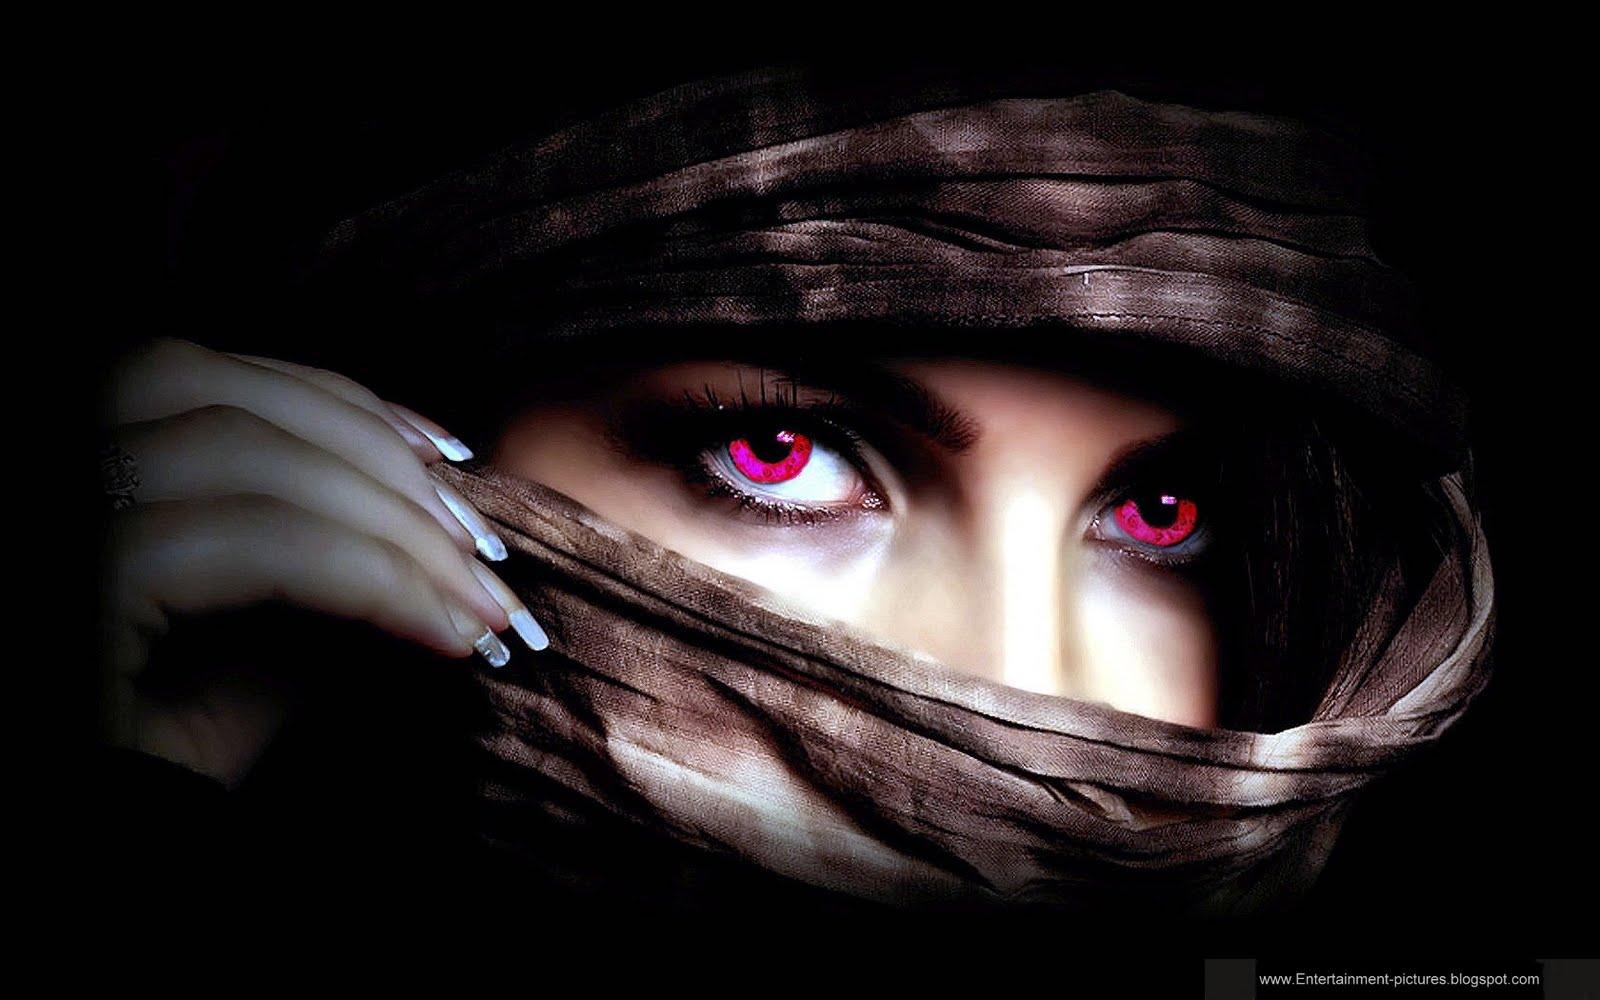 http://3.bp.blogspot.com/-IR1BWvOq6gM/TdNjcR8WA7I/AAAAAAAADkw/7jlOaqlnP_I/s1600/legend_eyes-wide.jpg